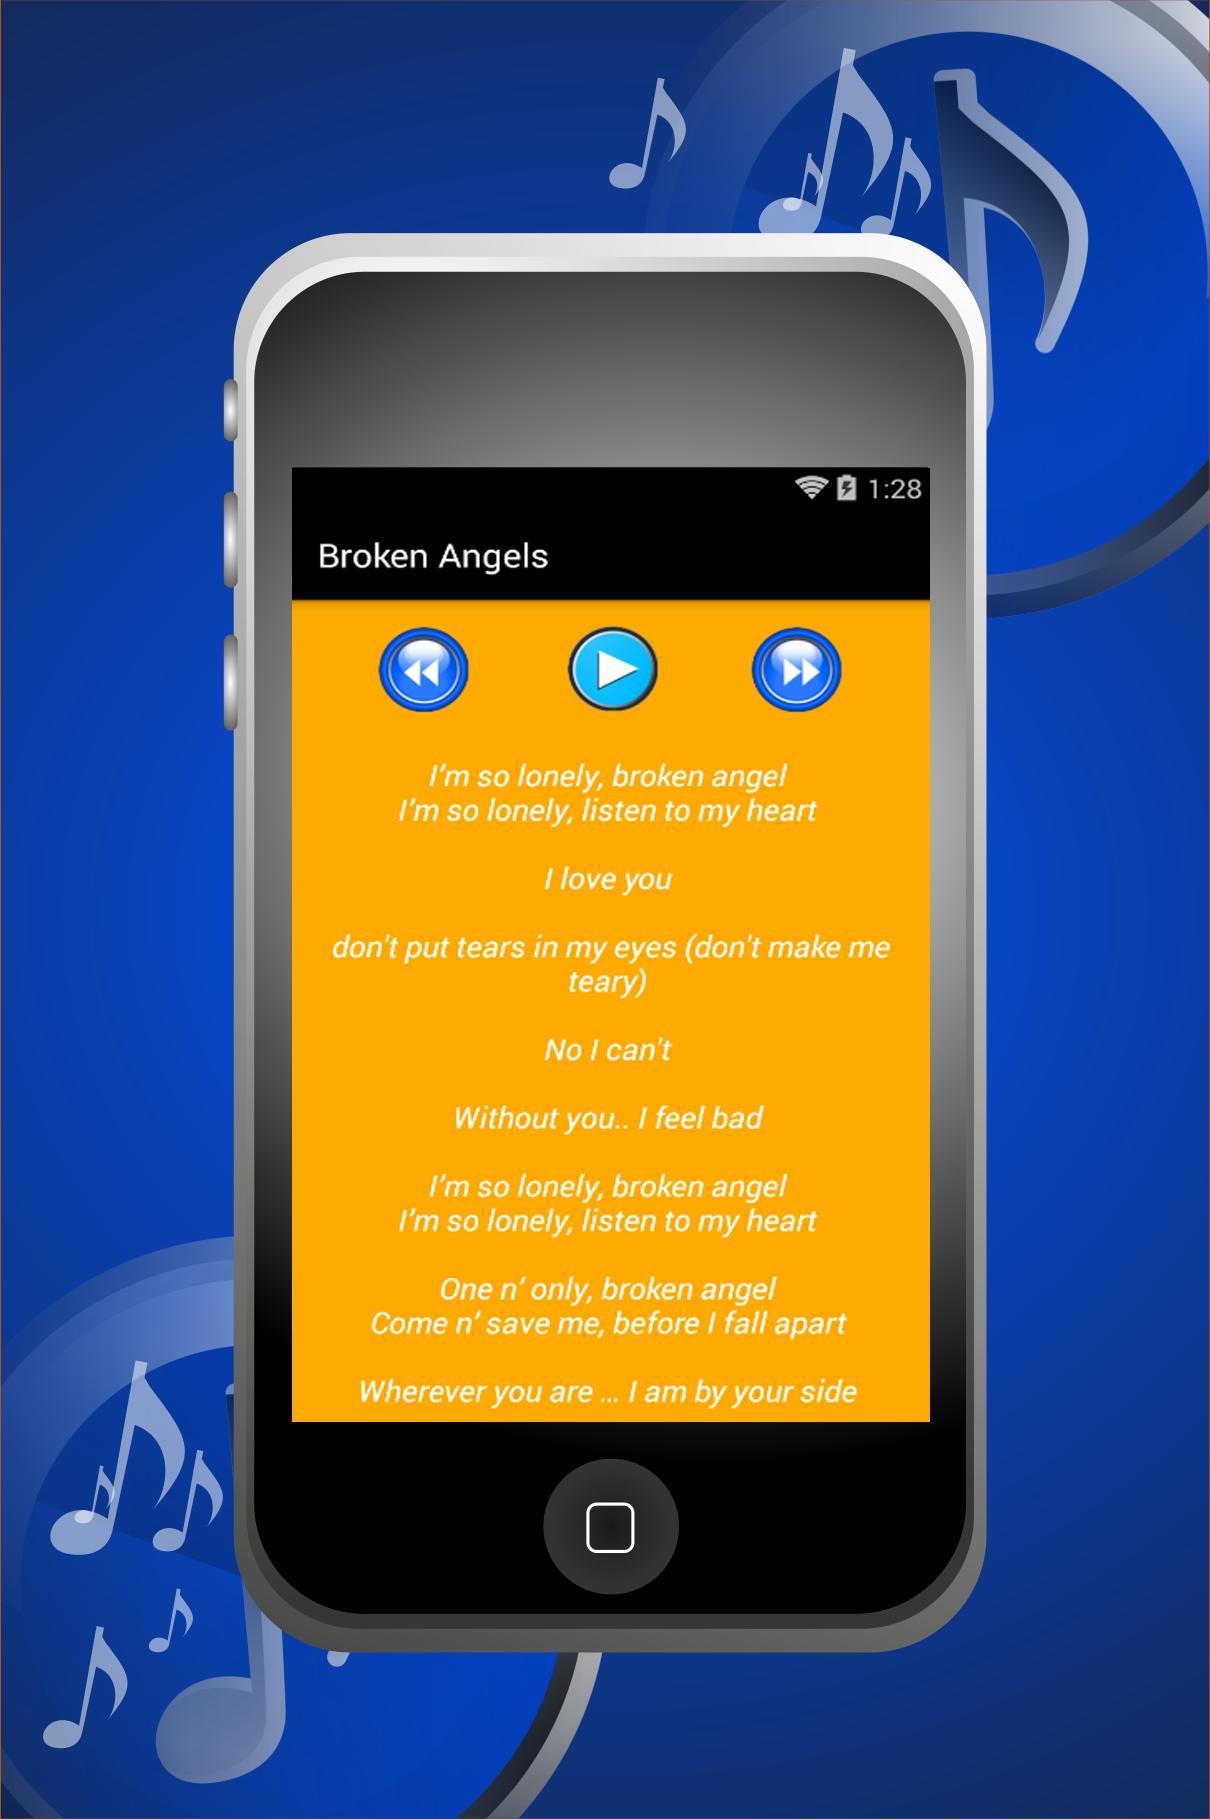 Arash Broken Angel Songs for Android - APK Download